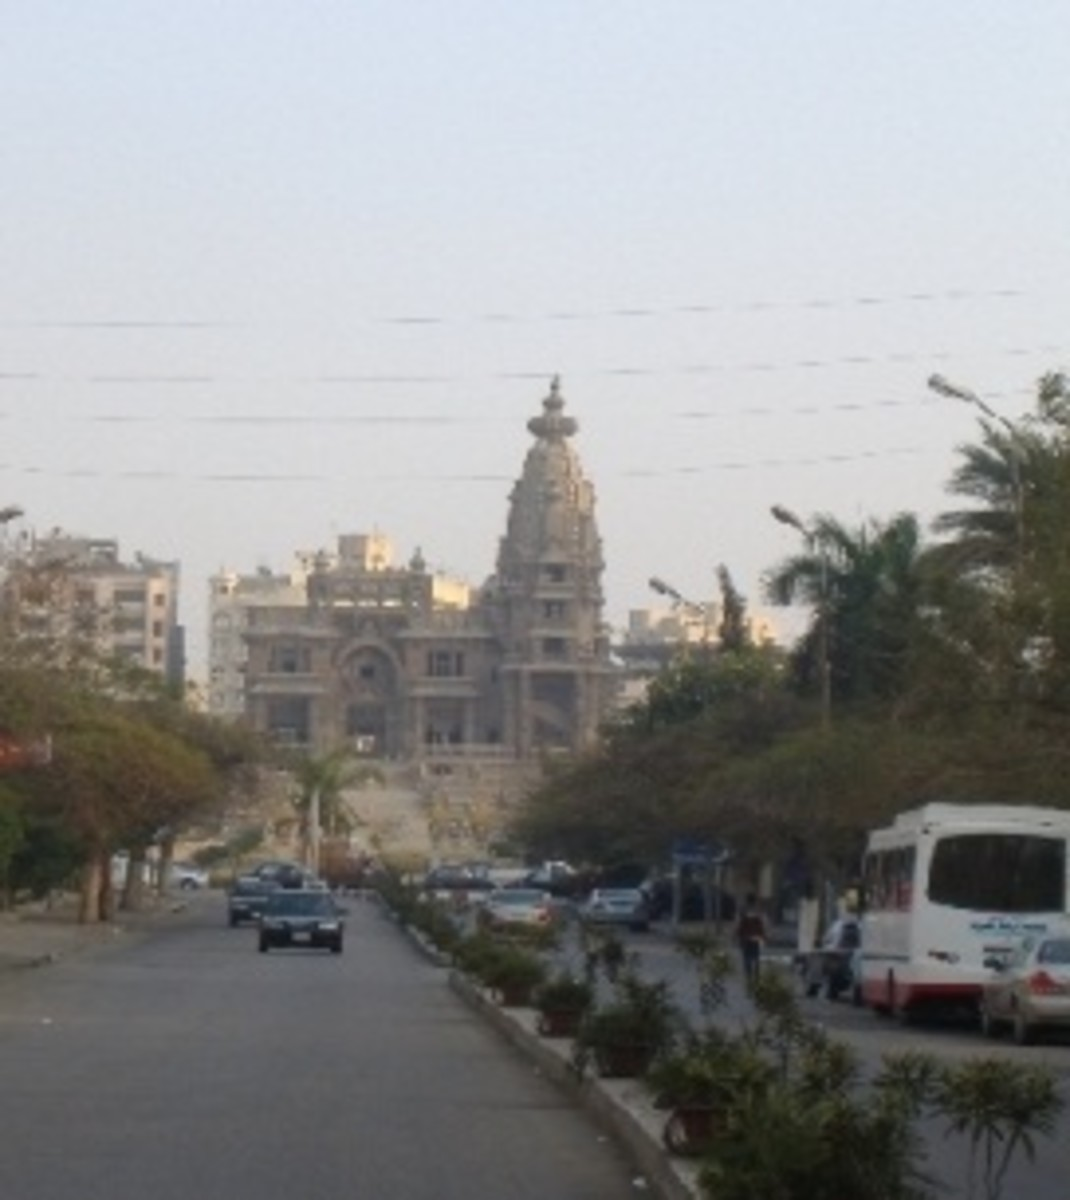 Baron Empain Palace in Heliopolis